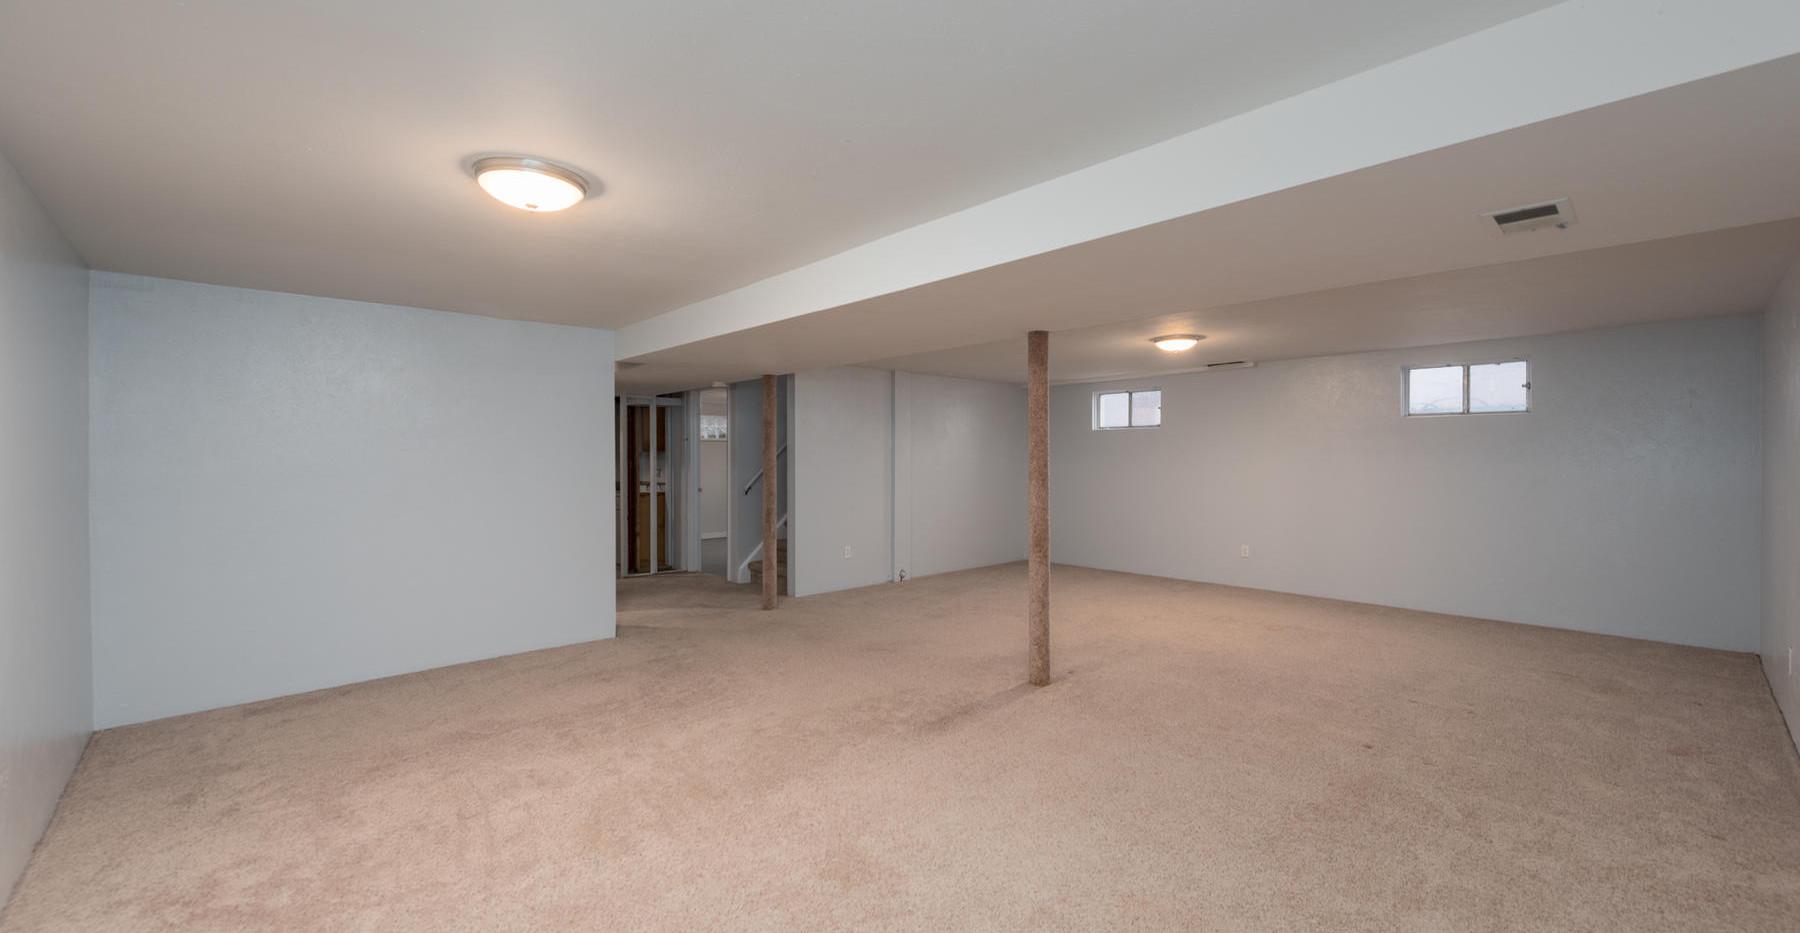 8626 W Utah Avenue-035-031-Lower Level-M